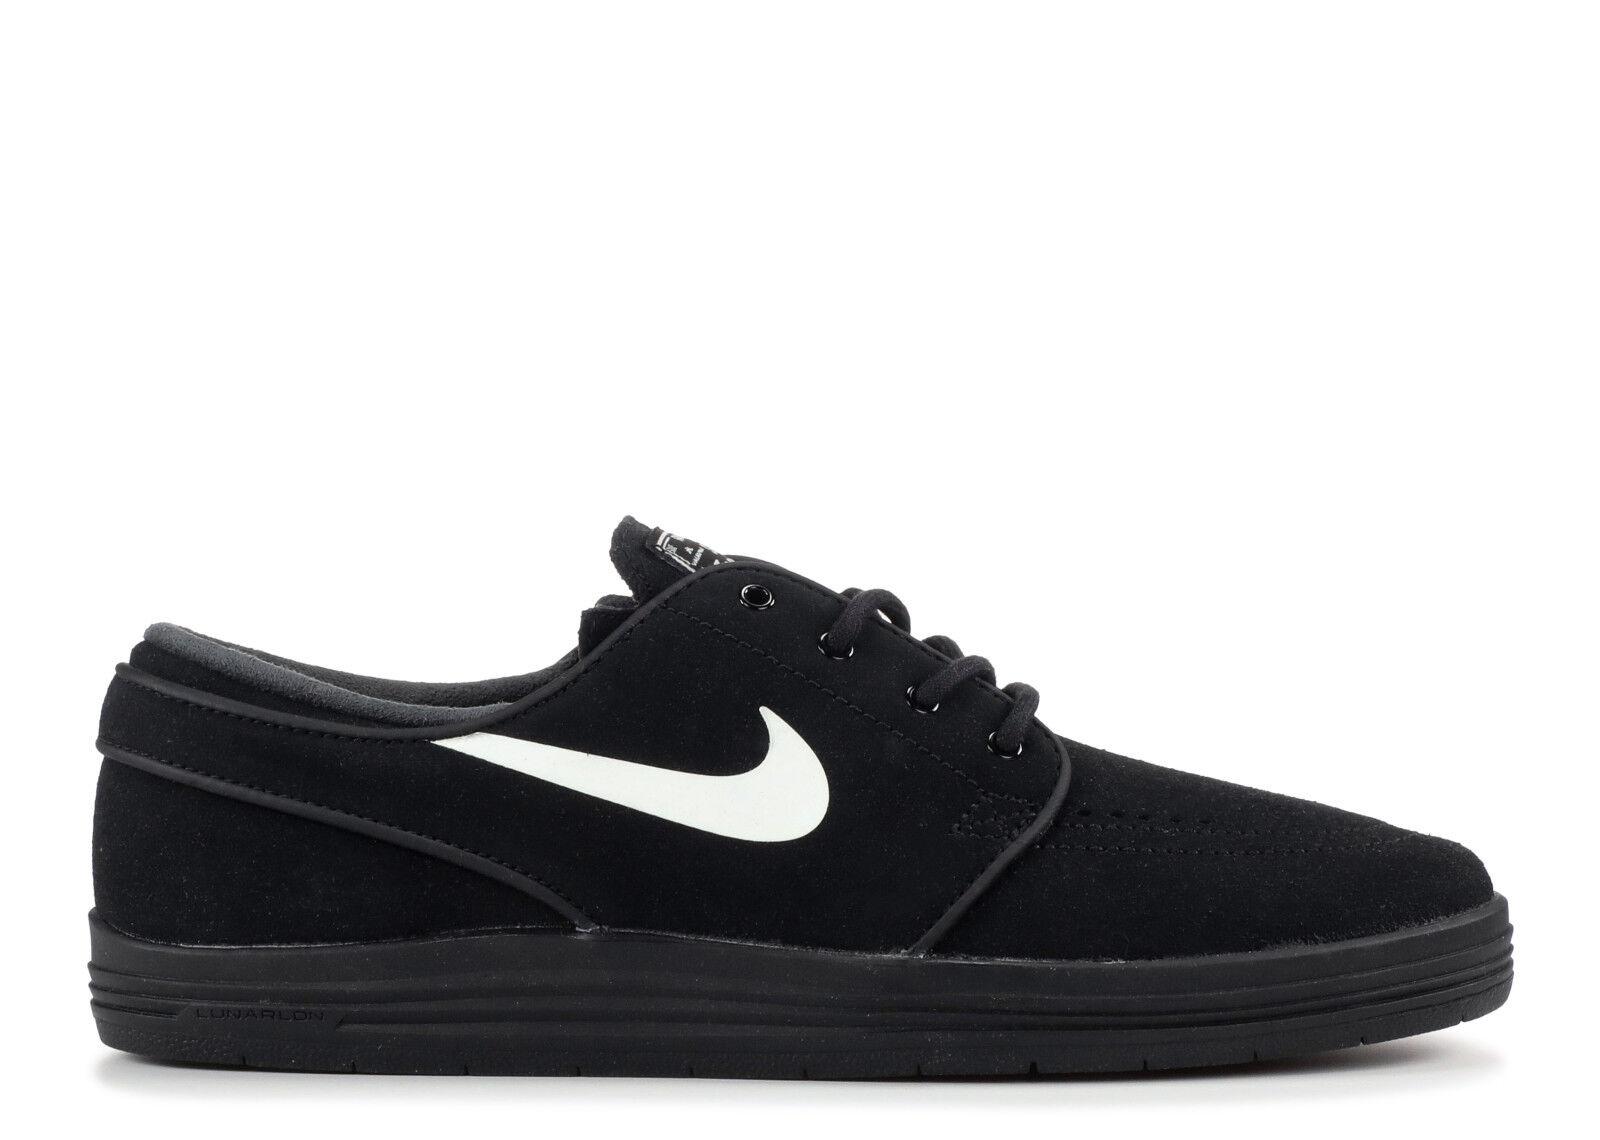 Nike lunar stefan janoski bianco nero occasionale pattinare sconto (589) scarpe da uomo